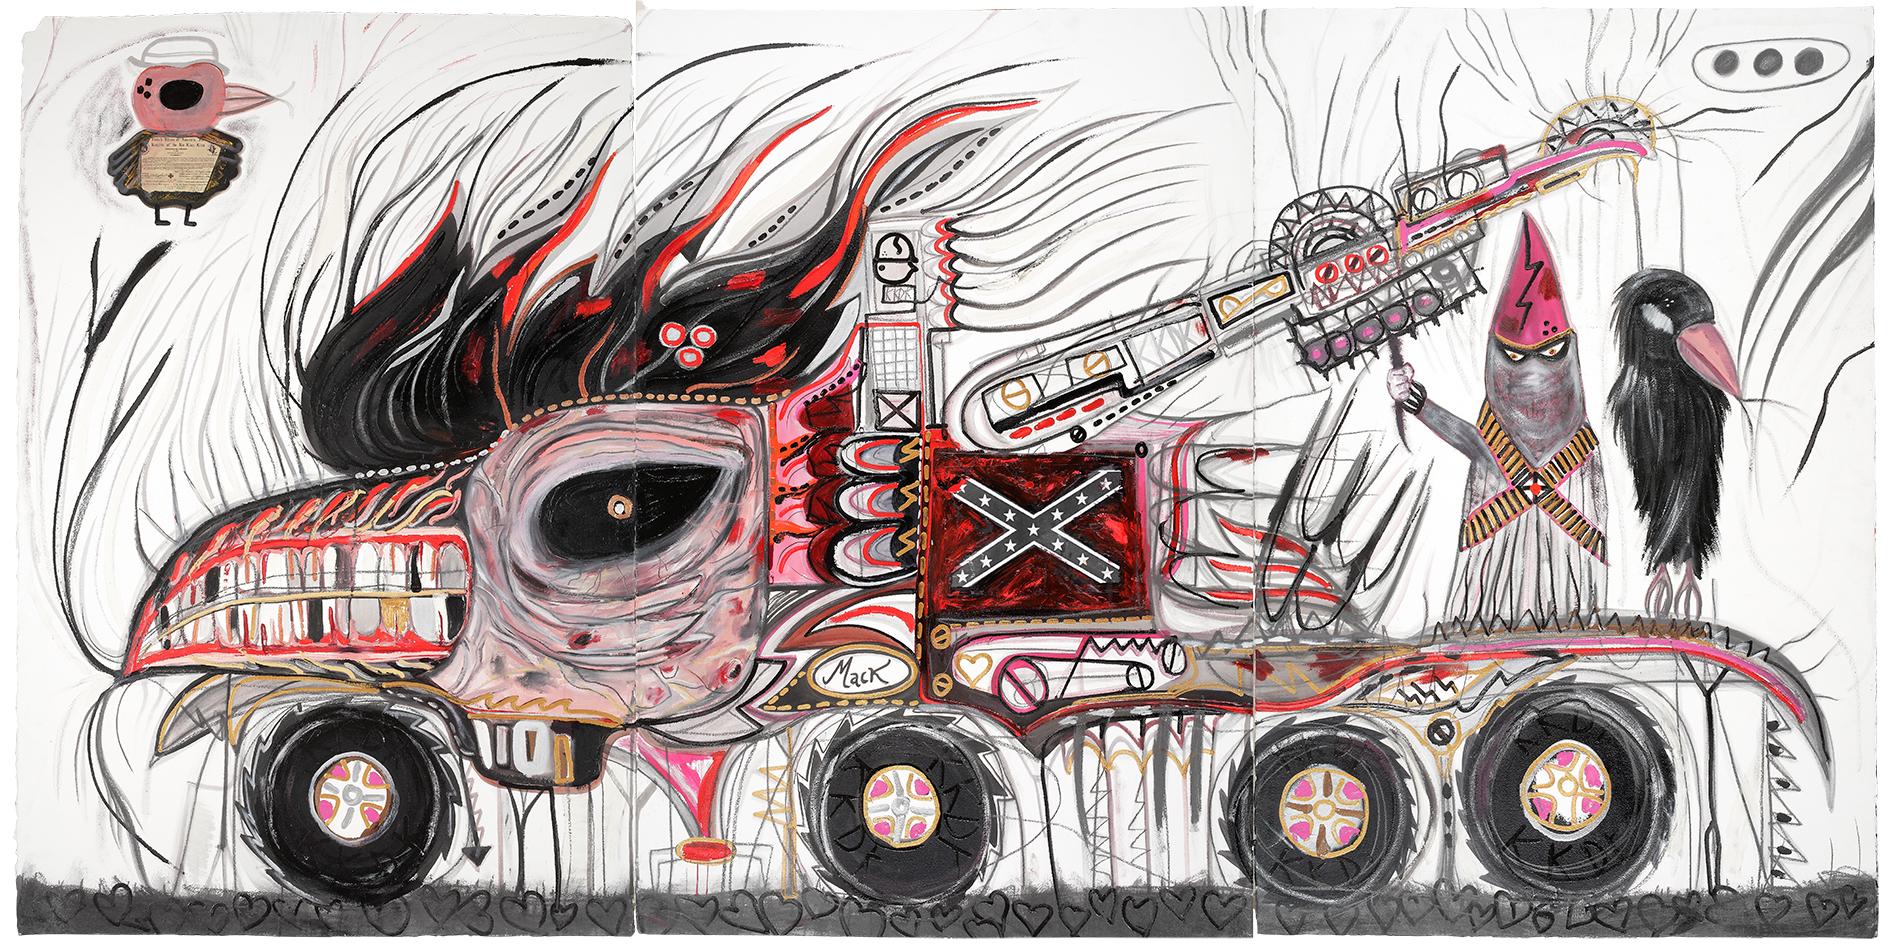 Philip Guston Cars. Abdul Vas. American Truck. Mack. Sir Barry Austin, TX 18666-Crowes-MACK, 2004. American Trucks Paintings. Pwr up, William Burroughs,